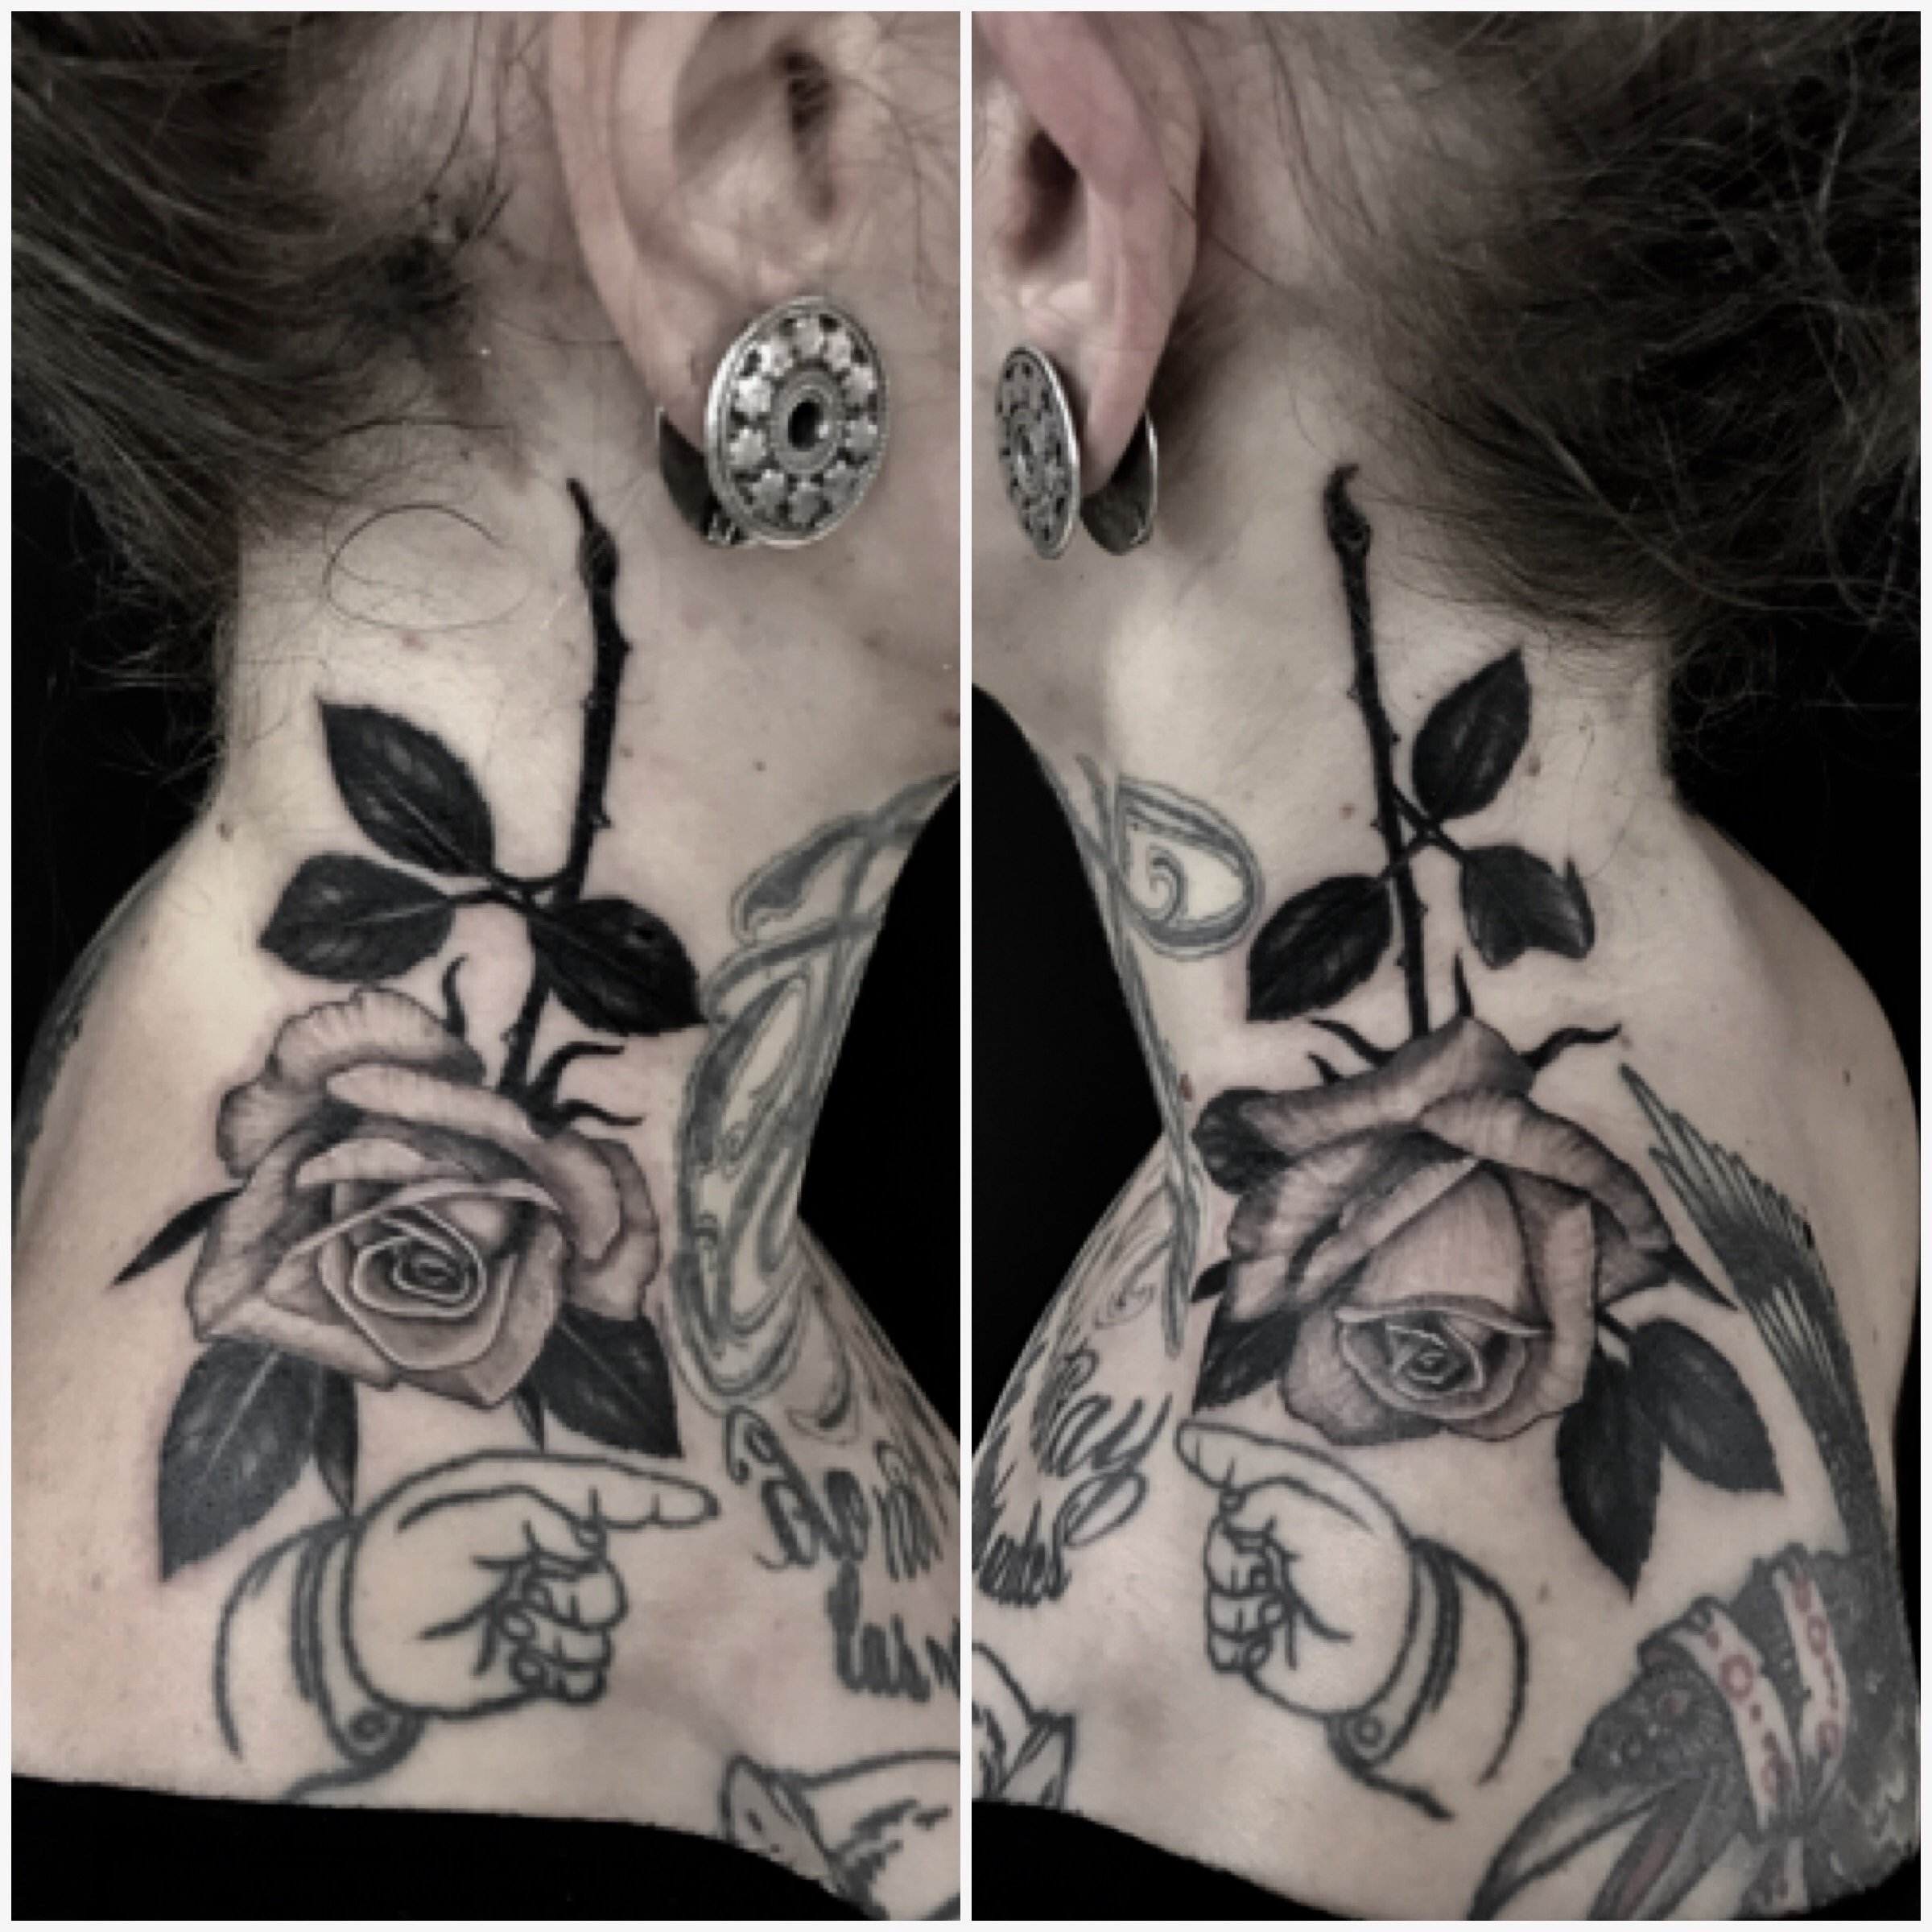 Gustavo Rierio tattoo 5.jpg